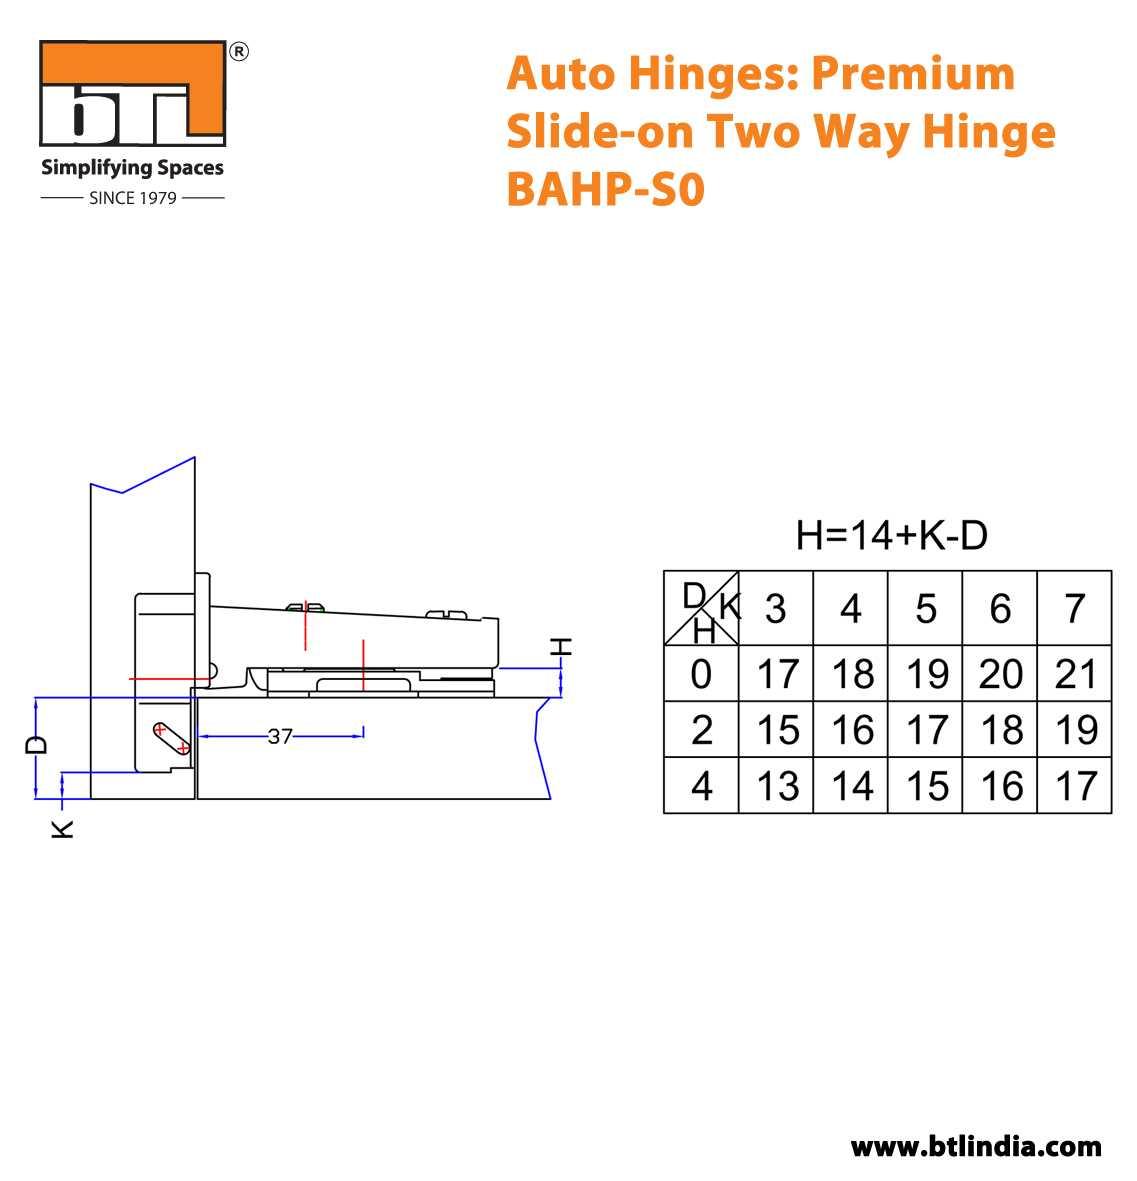 BTL BAHP-S0 Auto Hinge: Premium Slide-on Two Way Hinge